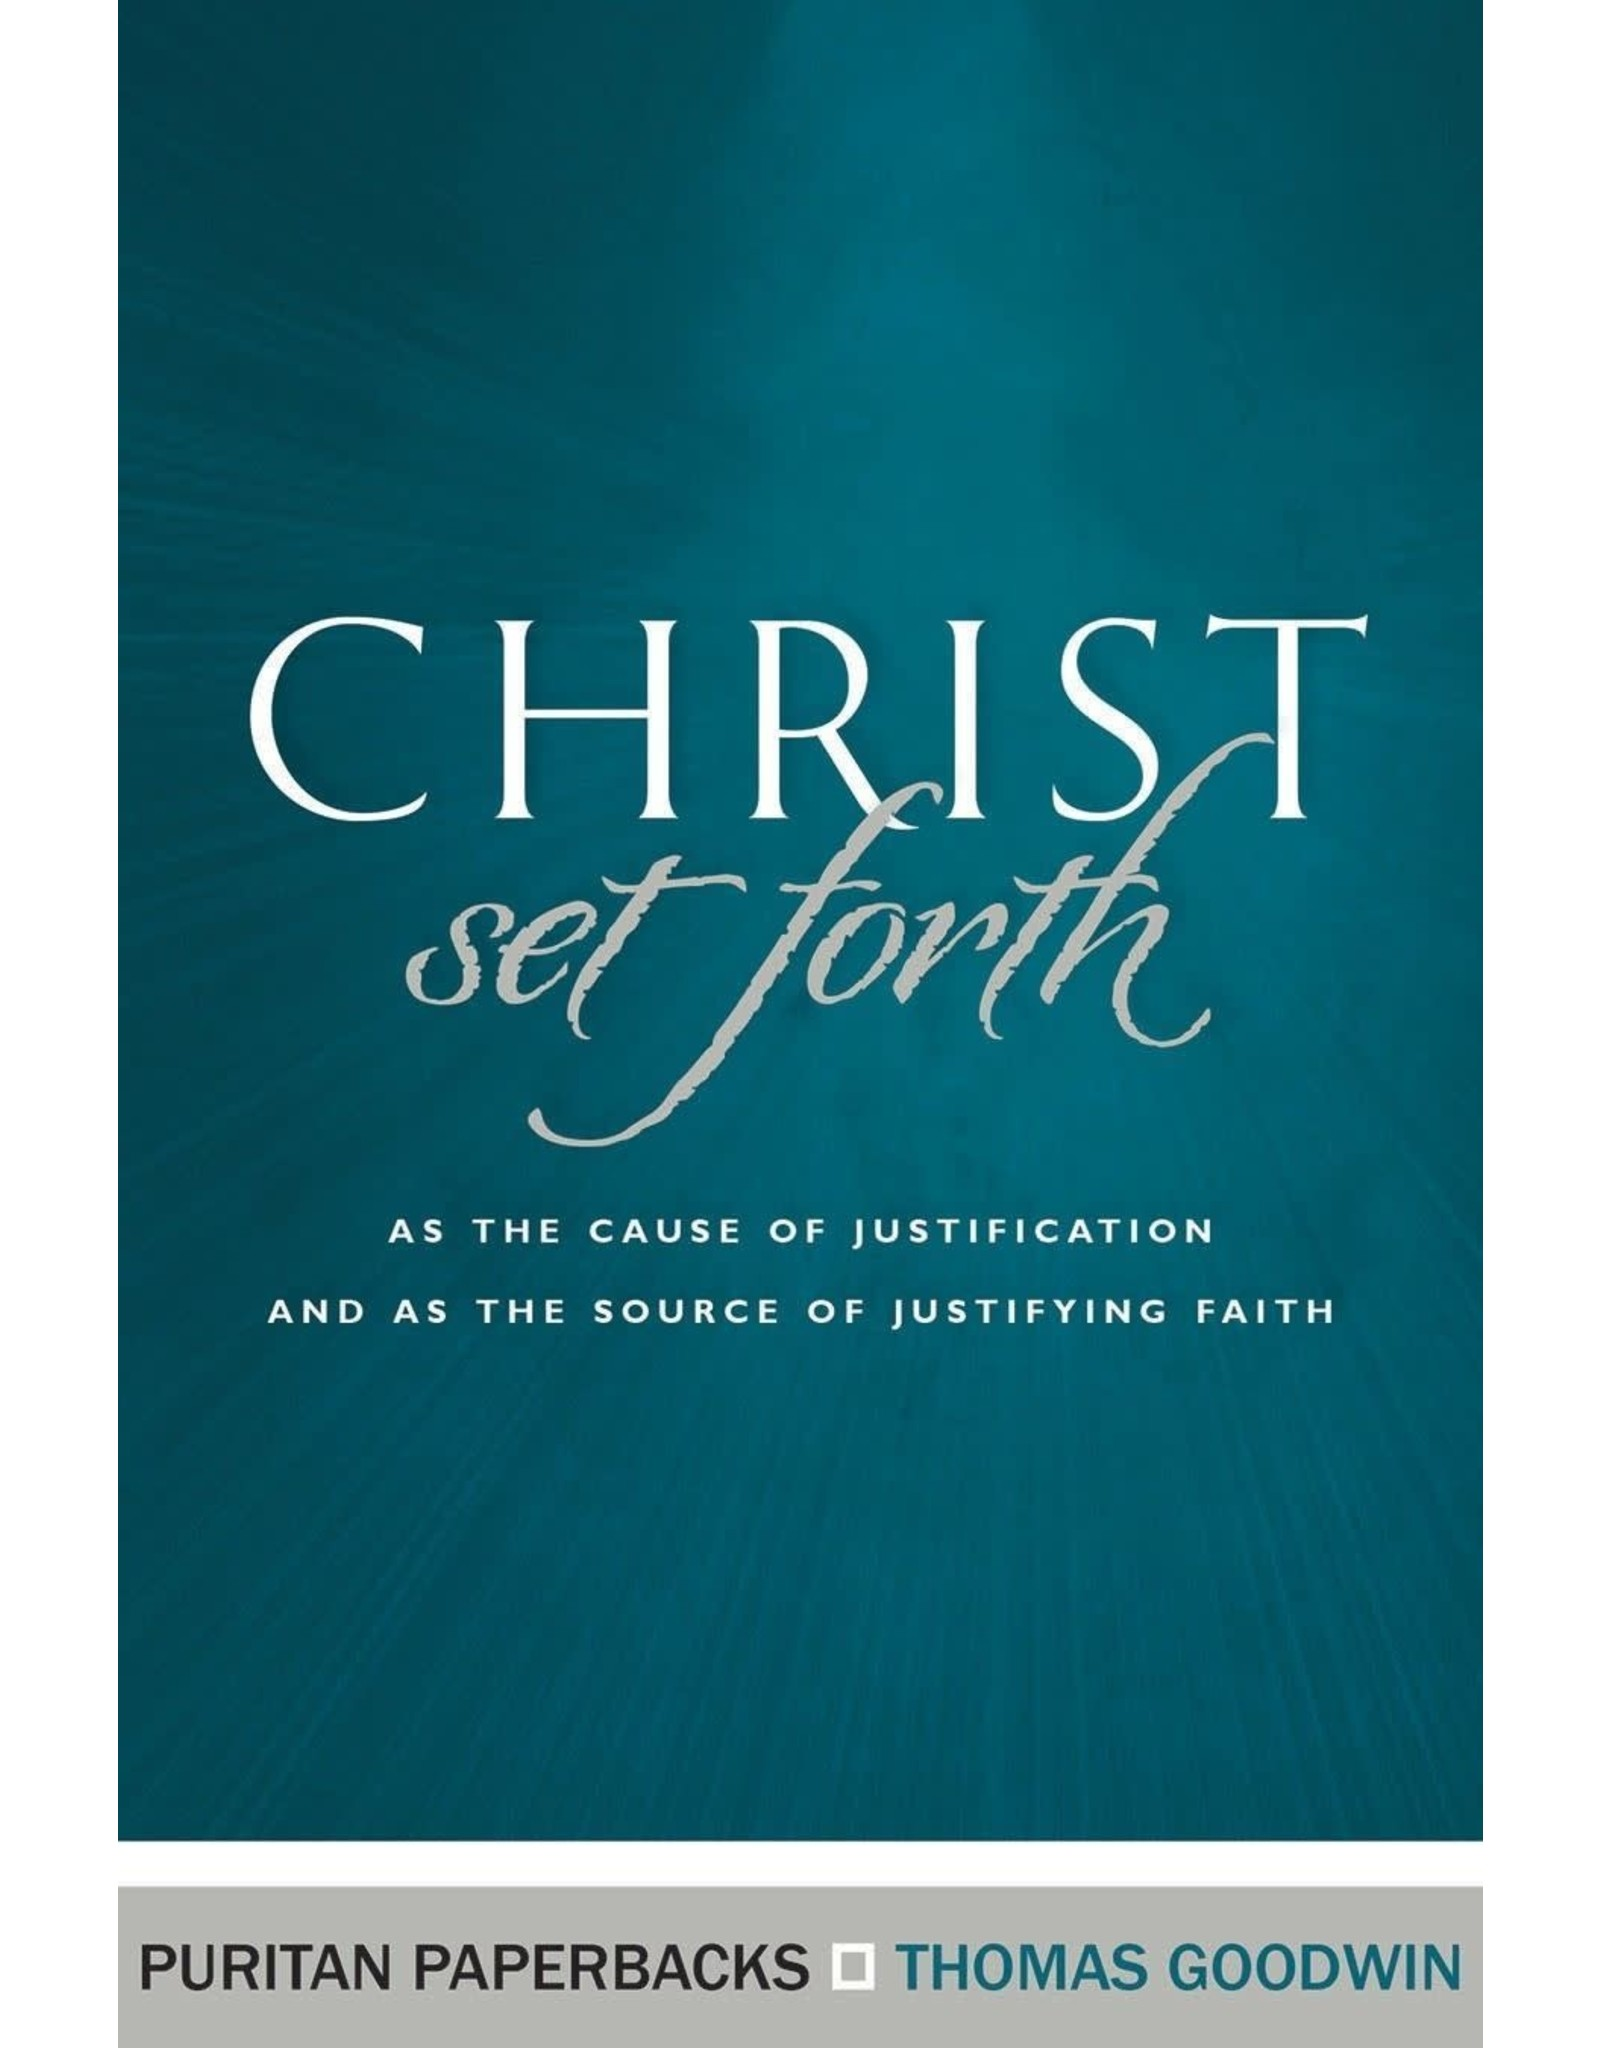 Goodwin Christ Set Forth (Puritan Paperbacks)